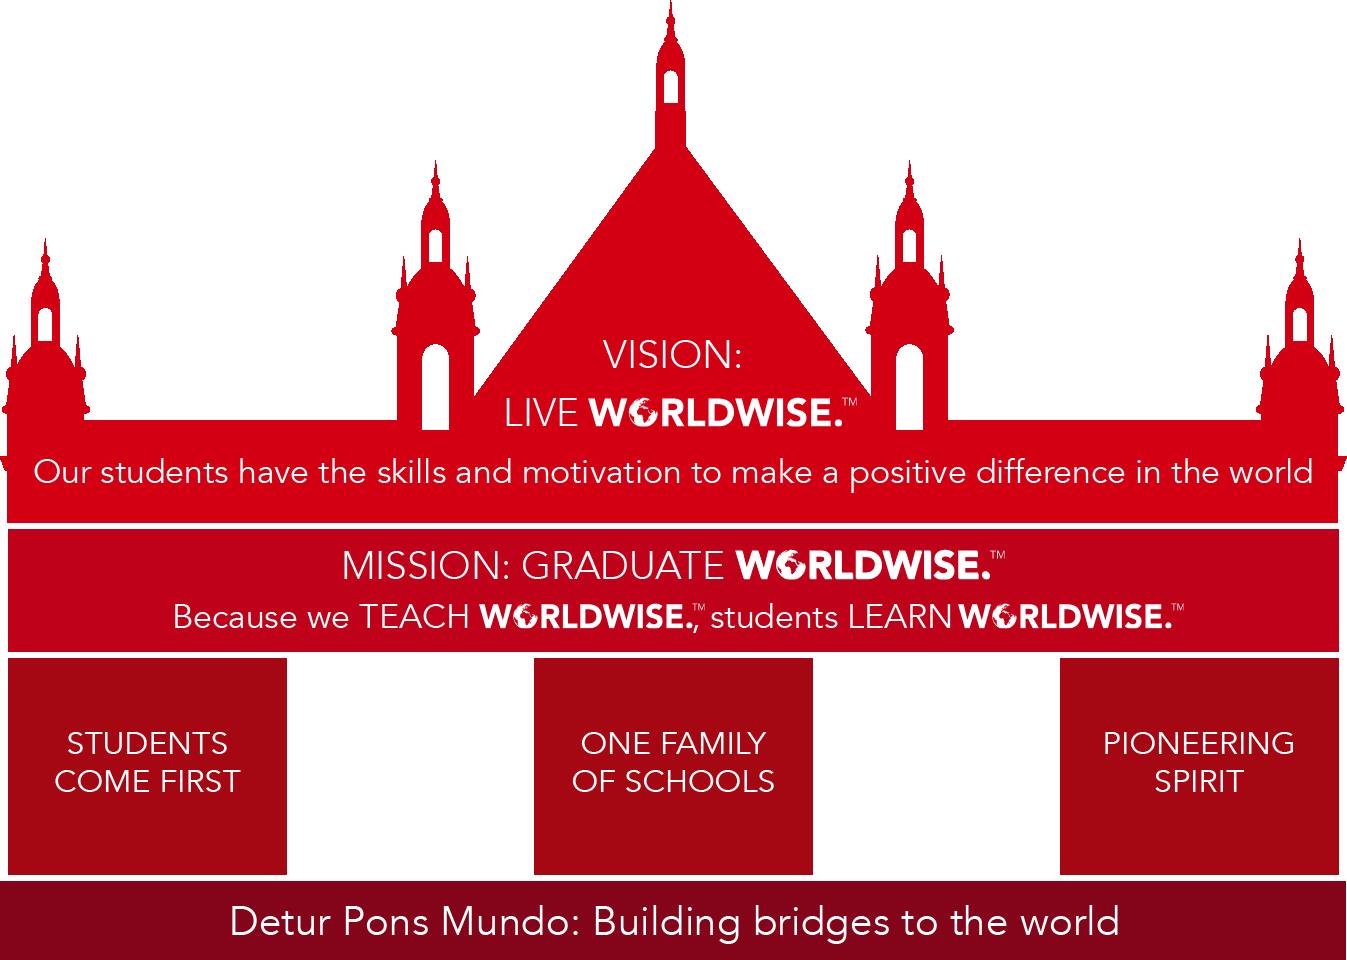 worldwise-dci-vision-tm